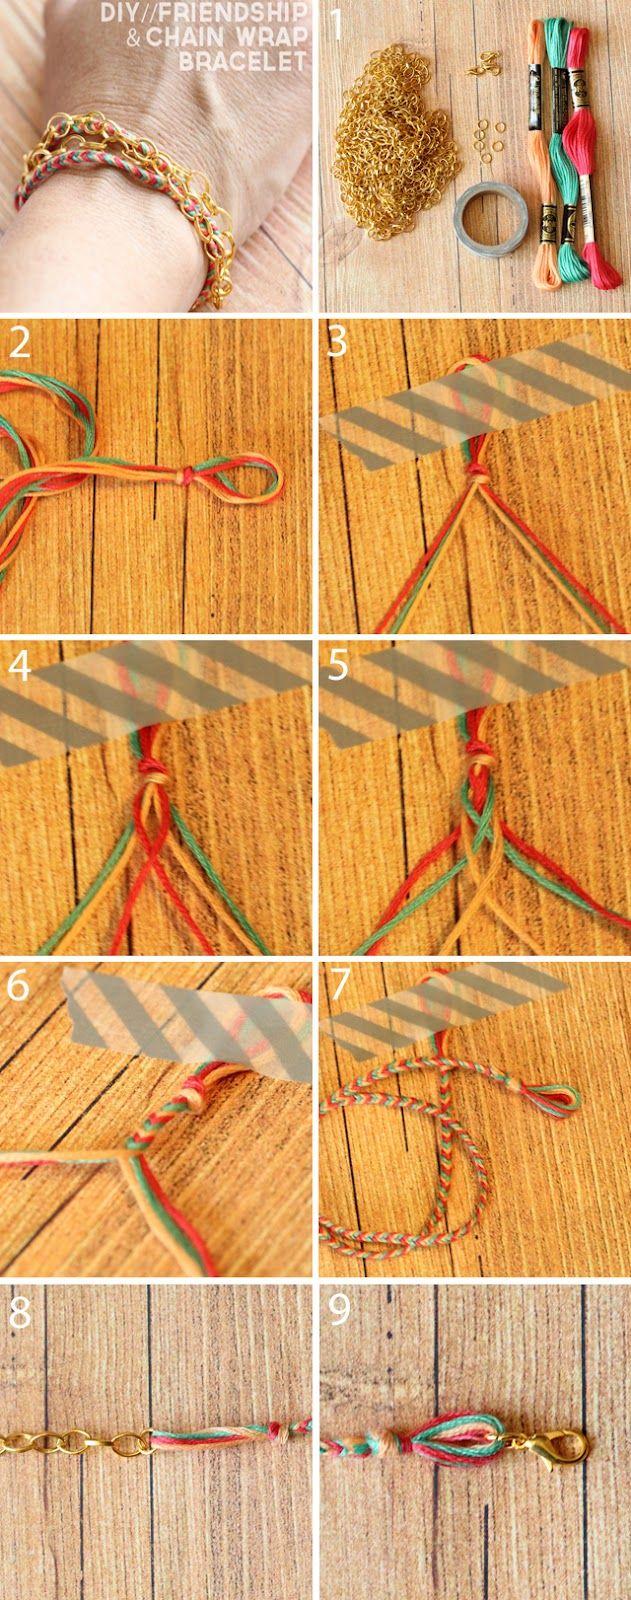 DIY Chain & Frienship Wrap Bracelet